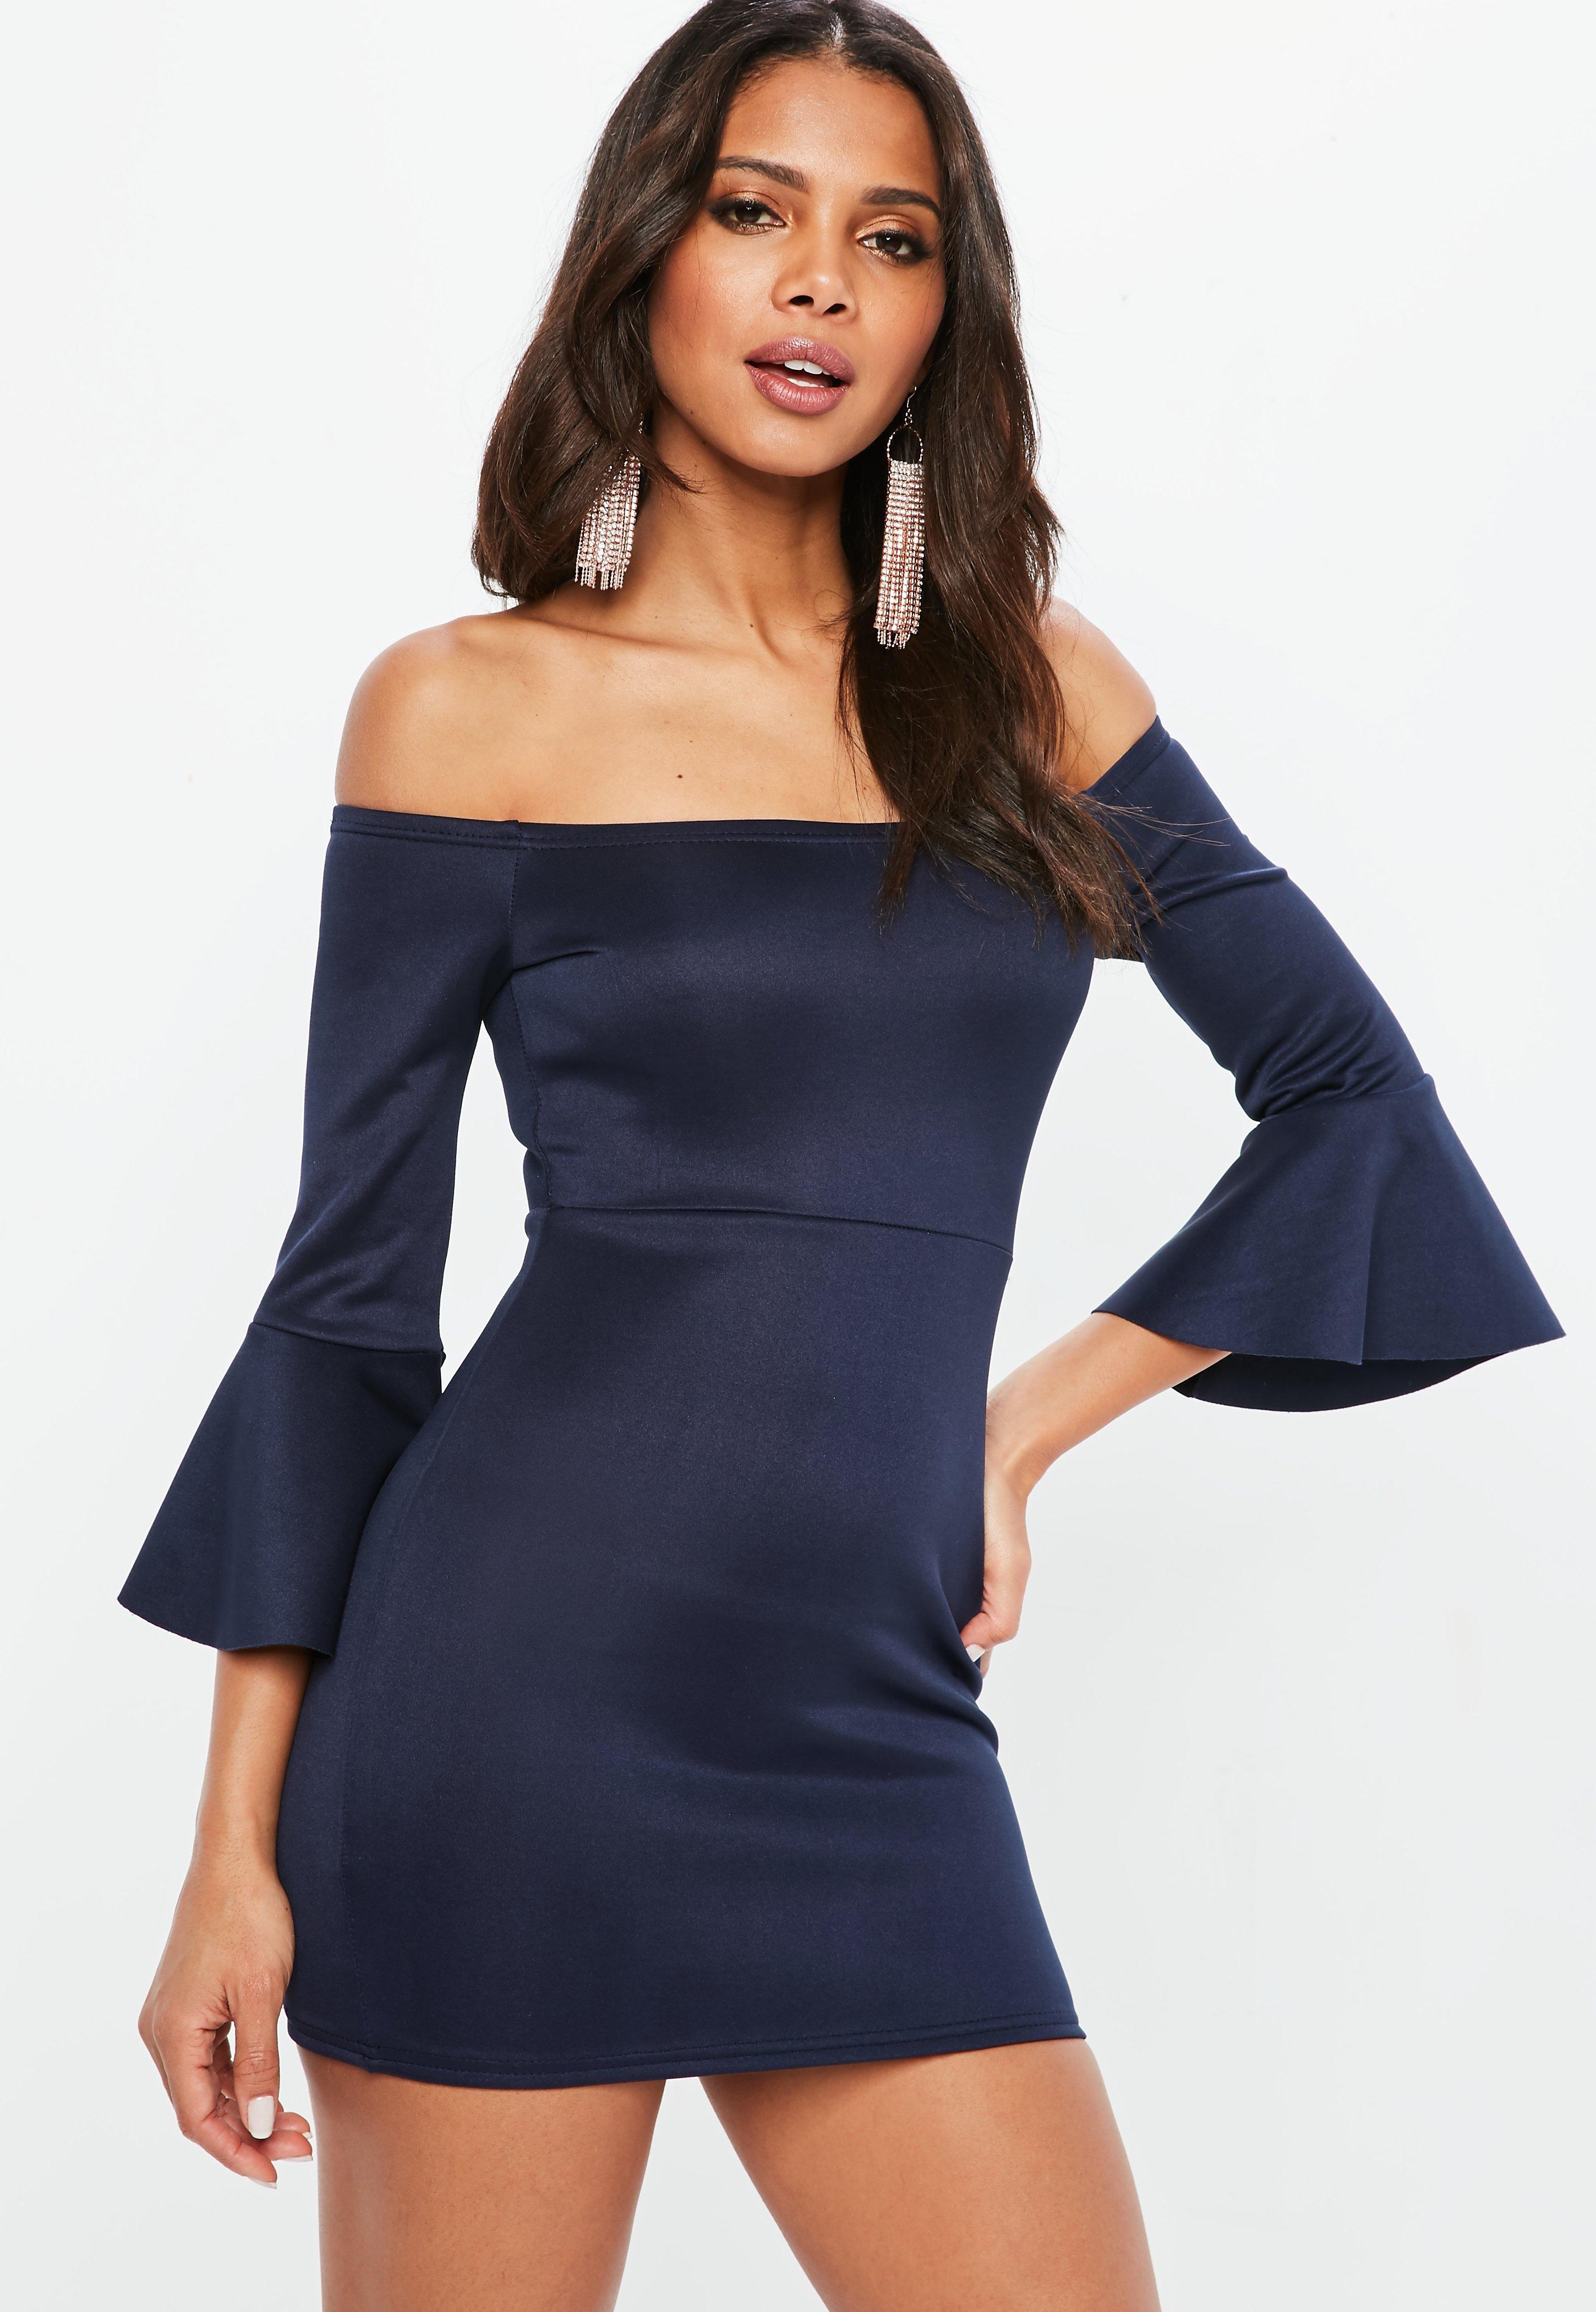 Cocktail Dresses | Classic Women\'s Dresses - Missguided